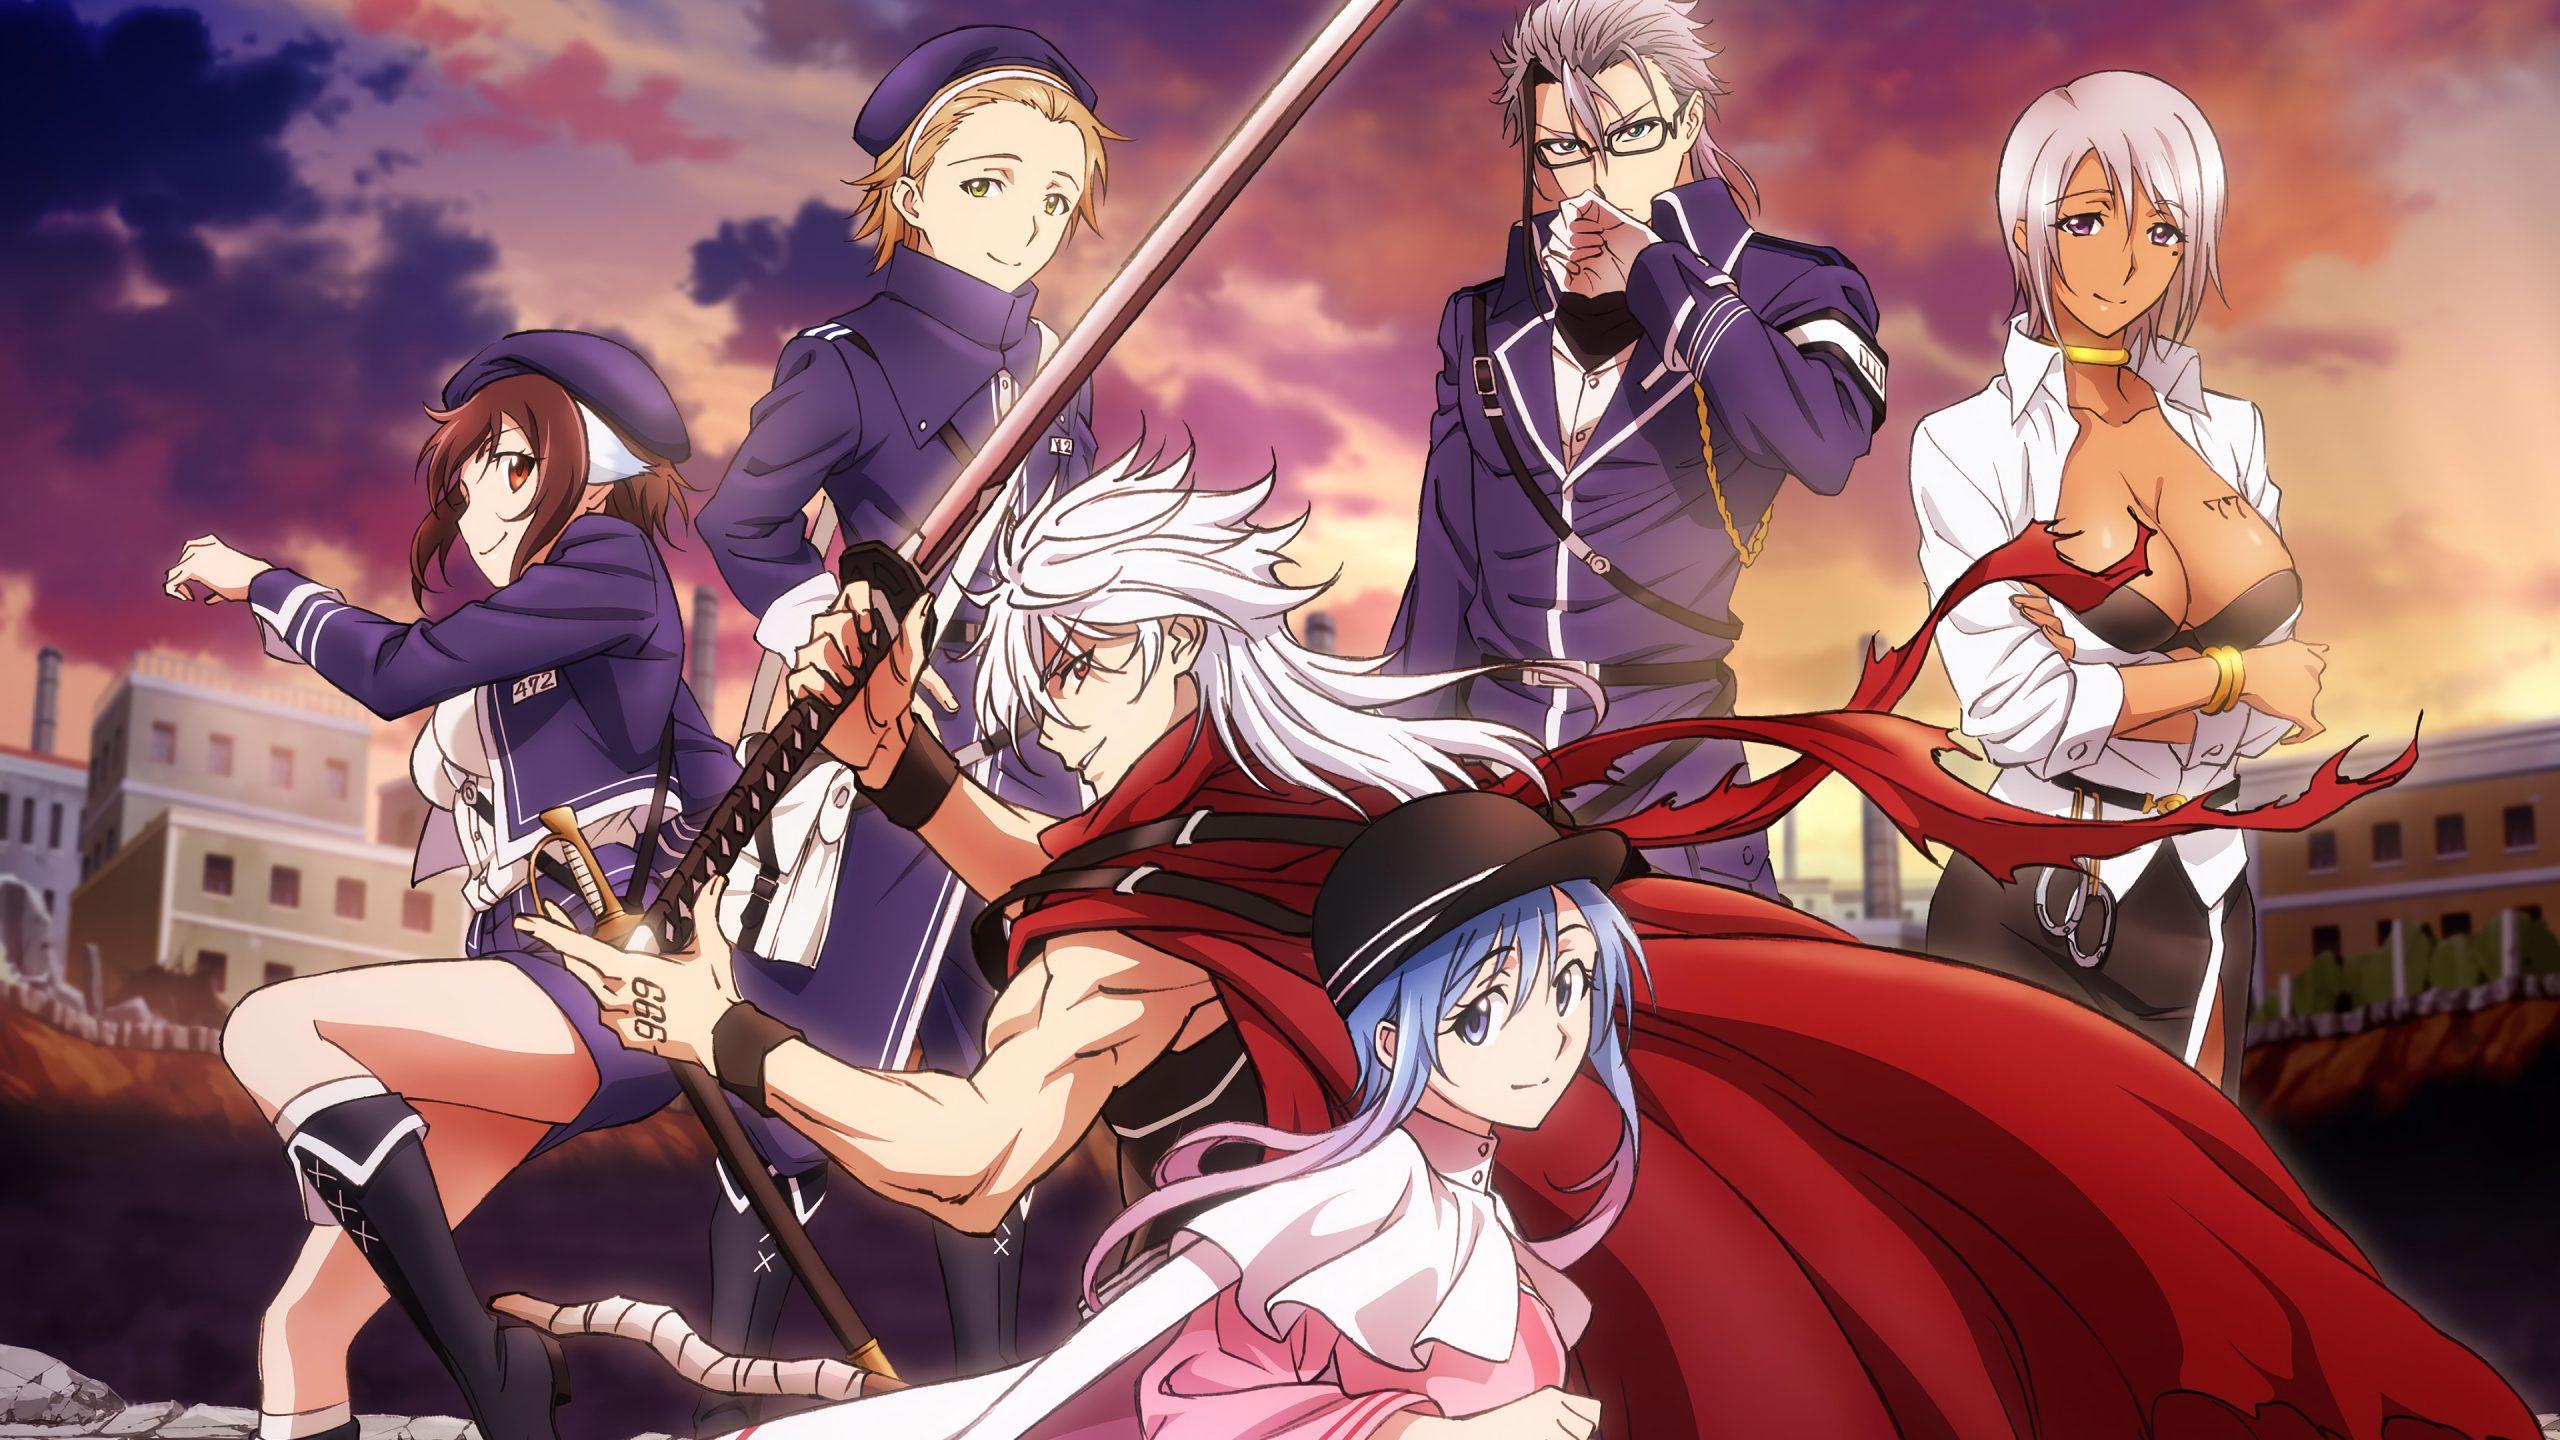 plunderer-anime-episode-22-release